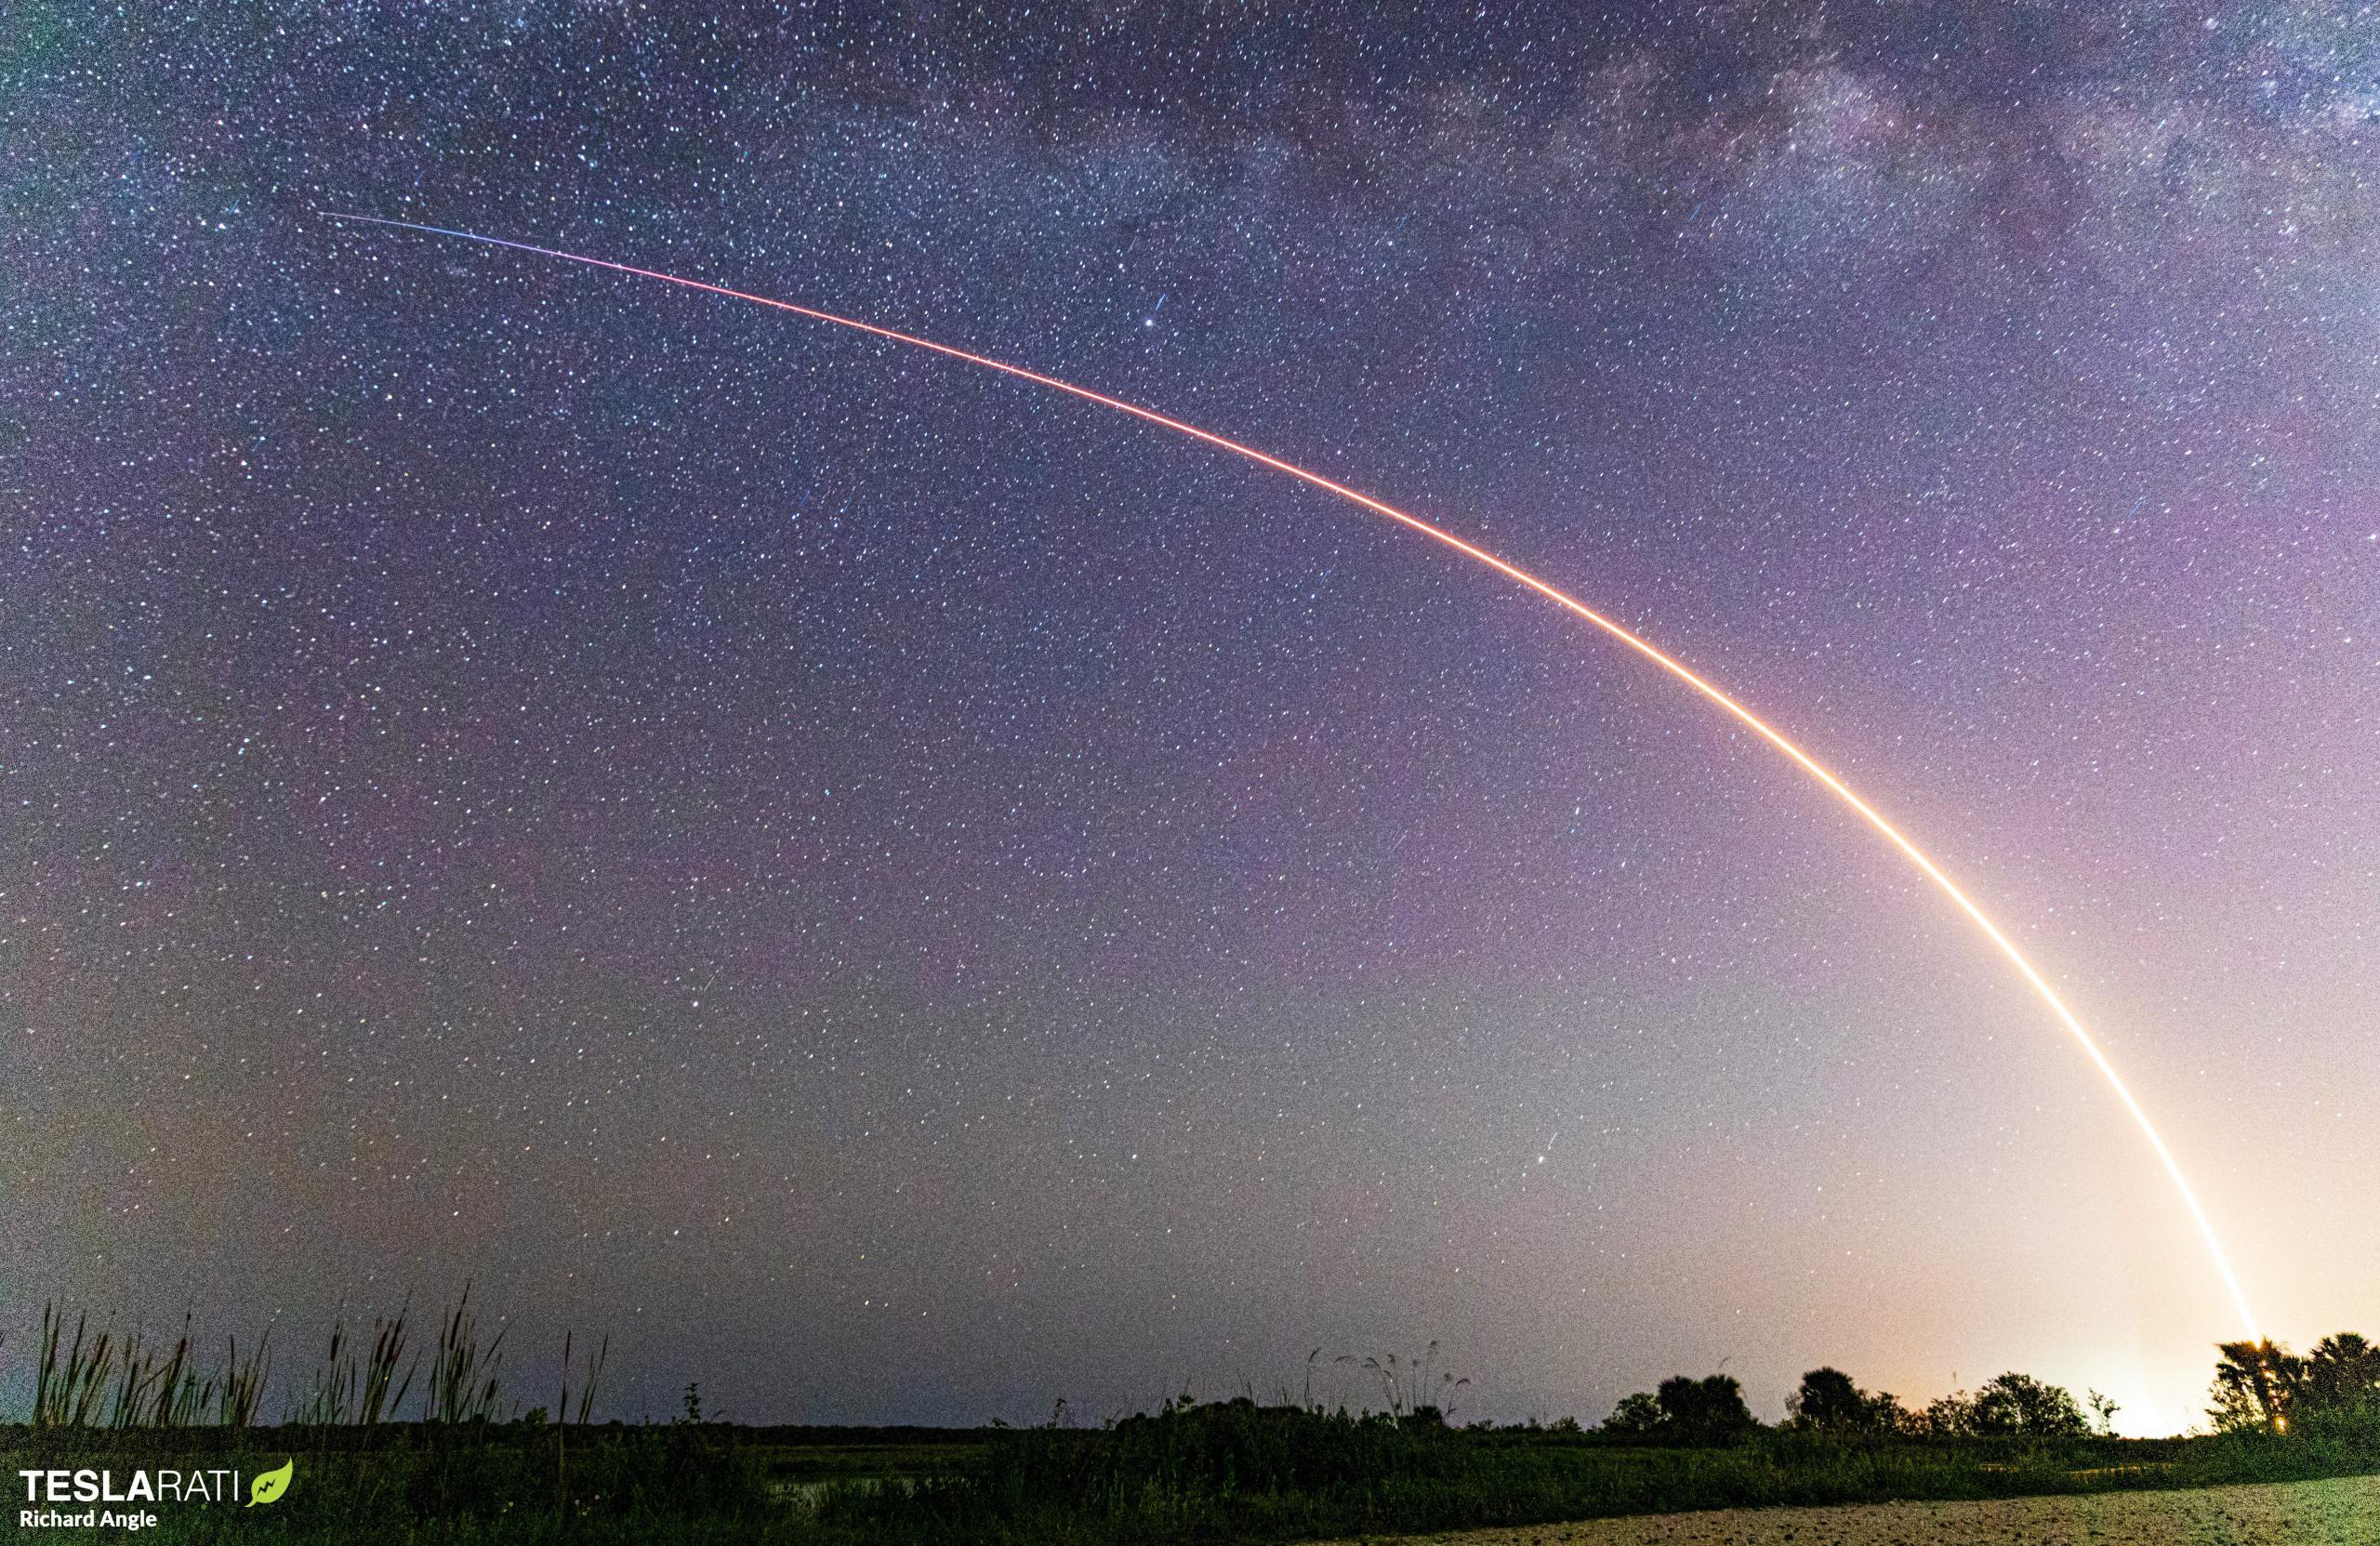 Starlink-27 Falcon 9 B1051 050921 (Richard Angle) 2 (c)